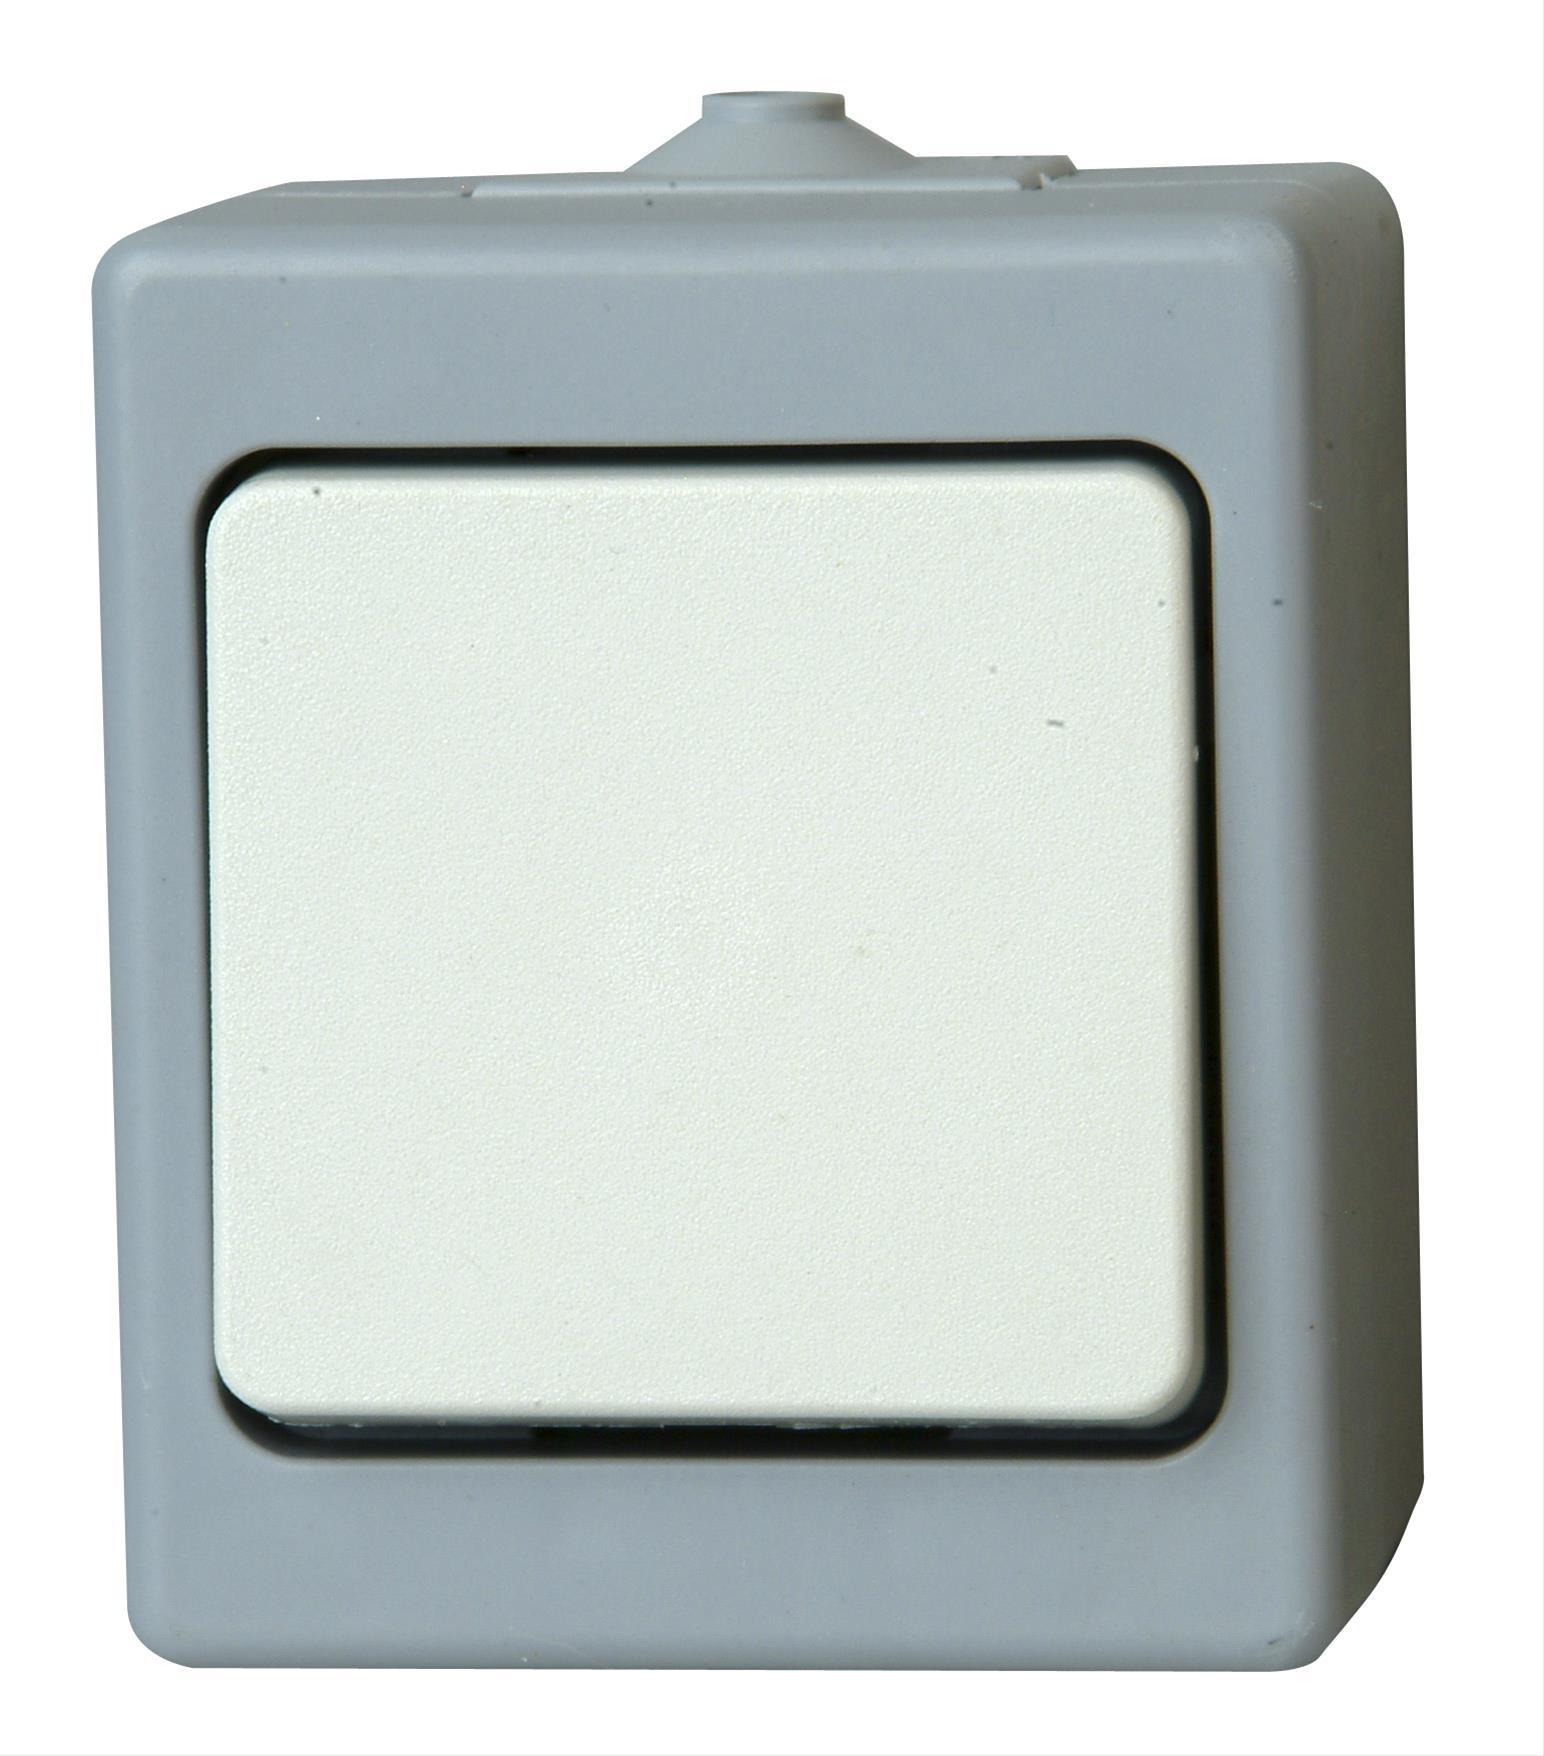 Kopp STANDARD Taster grau Bild 1